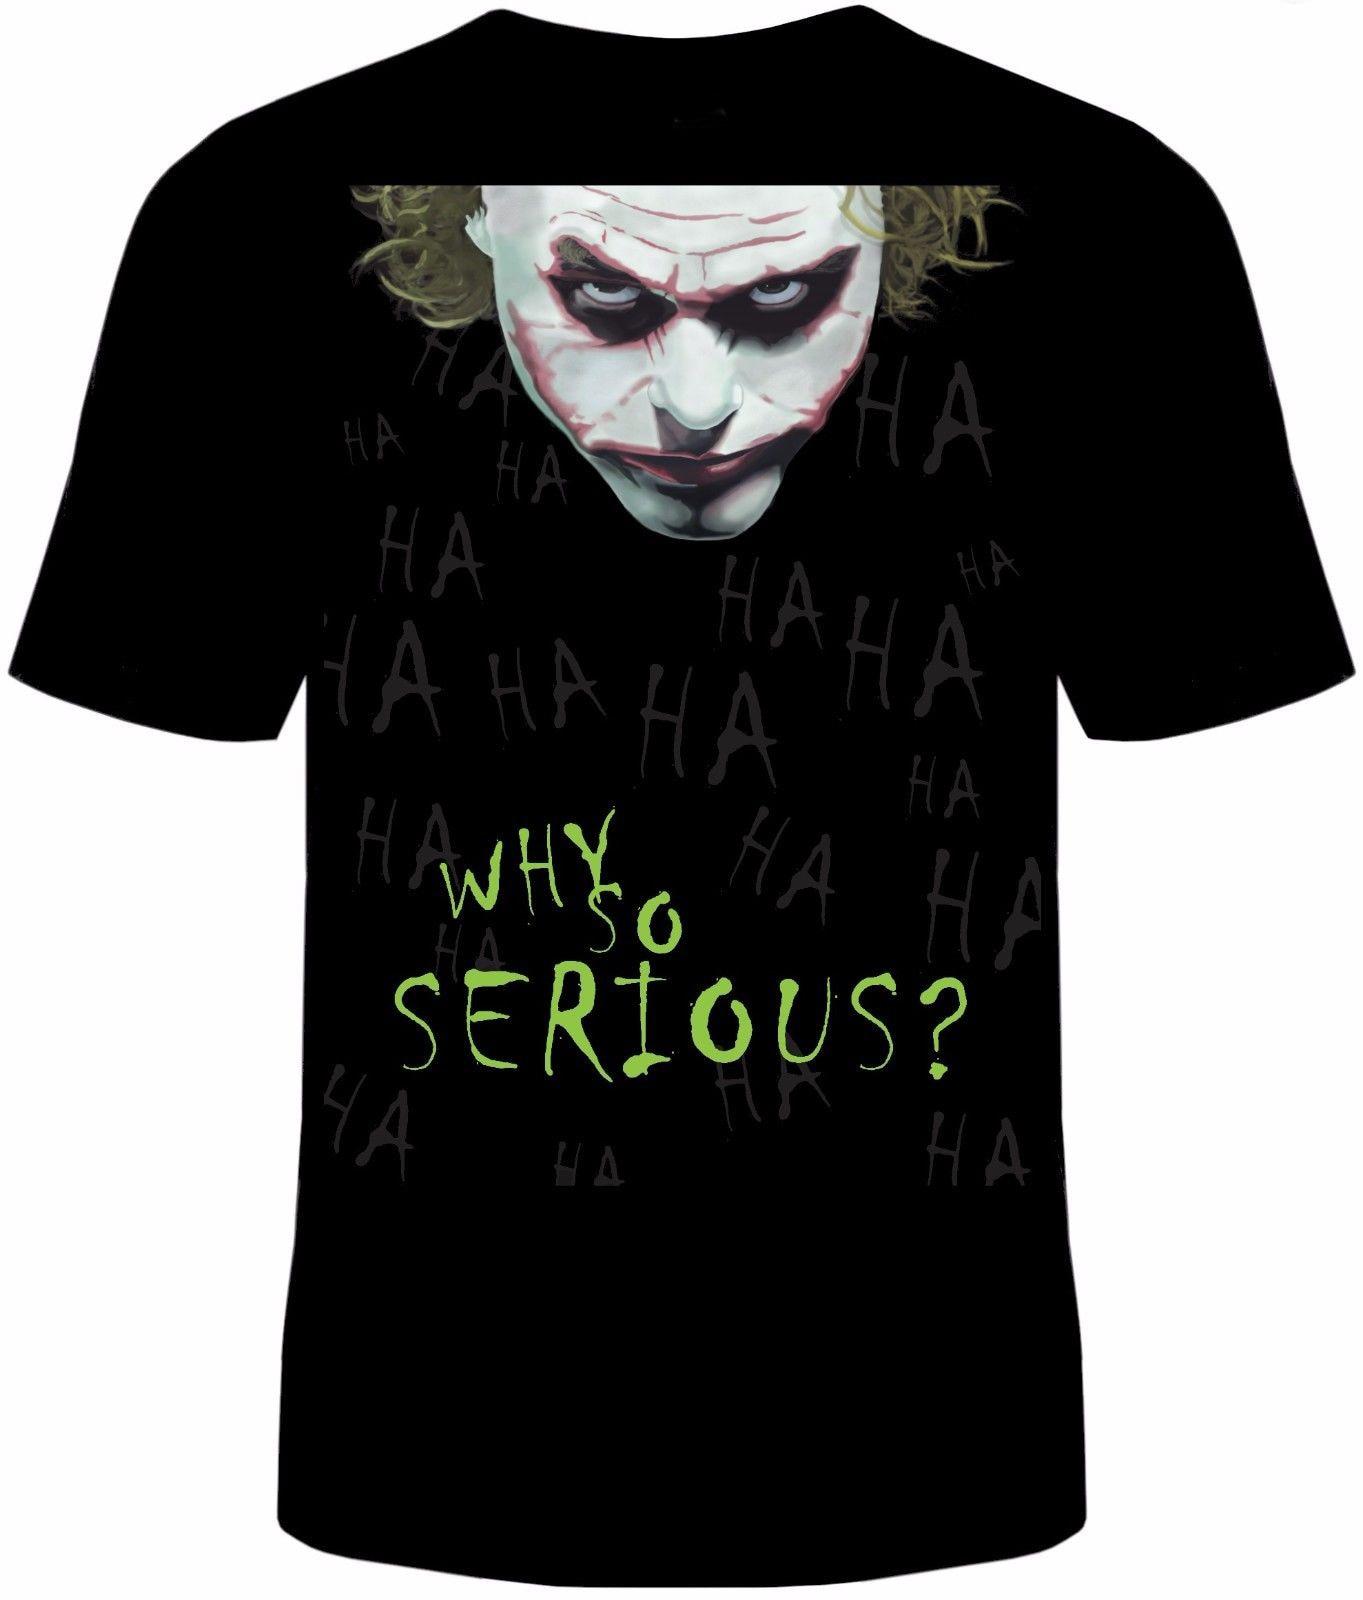 Why So Serious Joker T-Shirt Unisex Cotton Adult Batman Halloween Sizes New